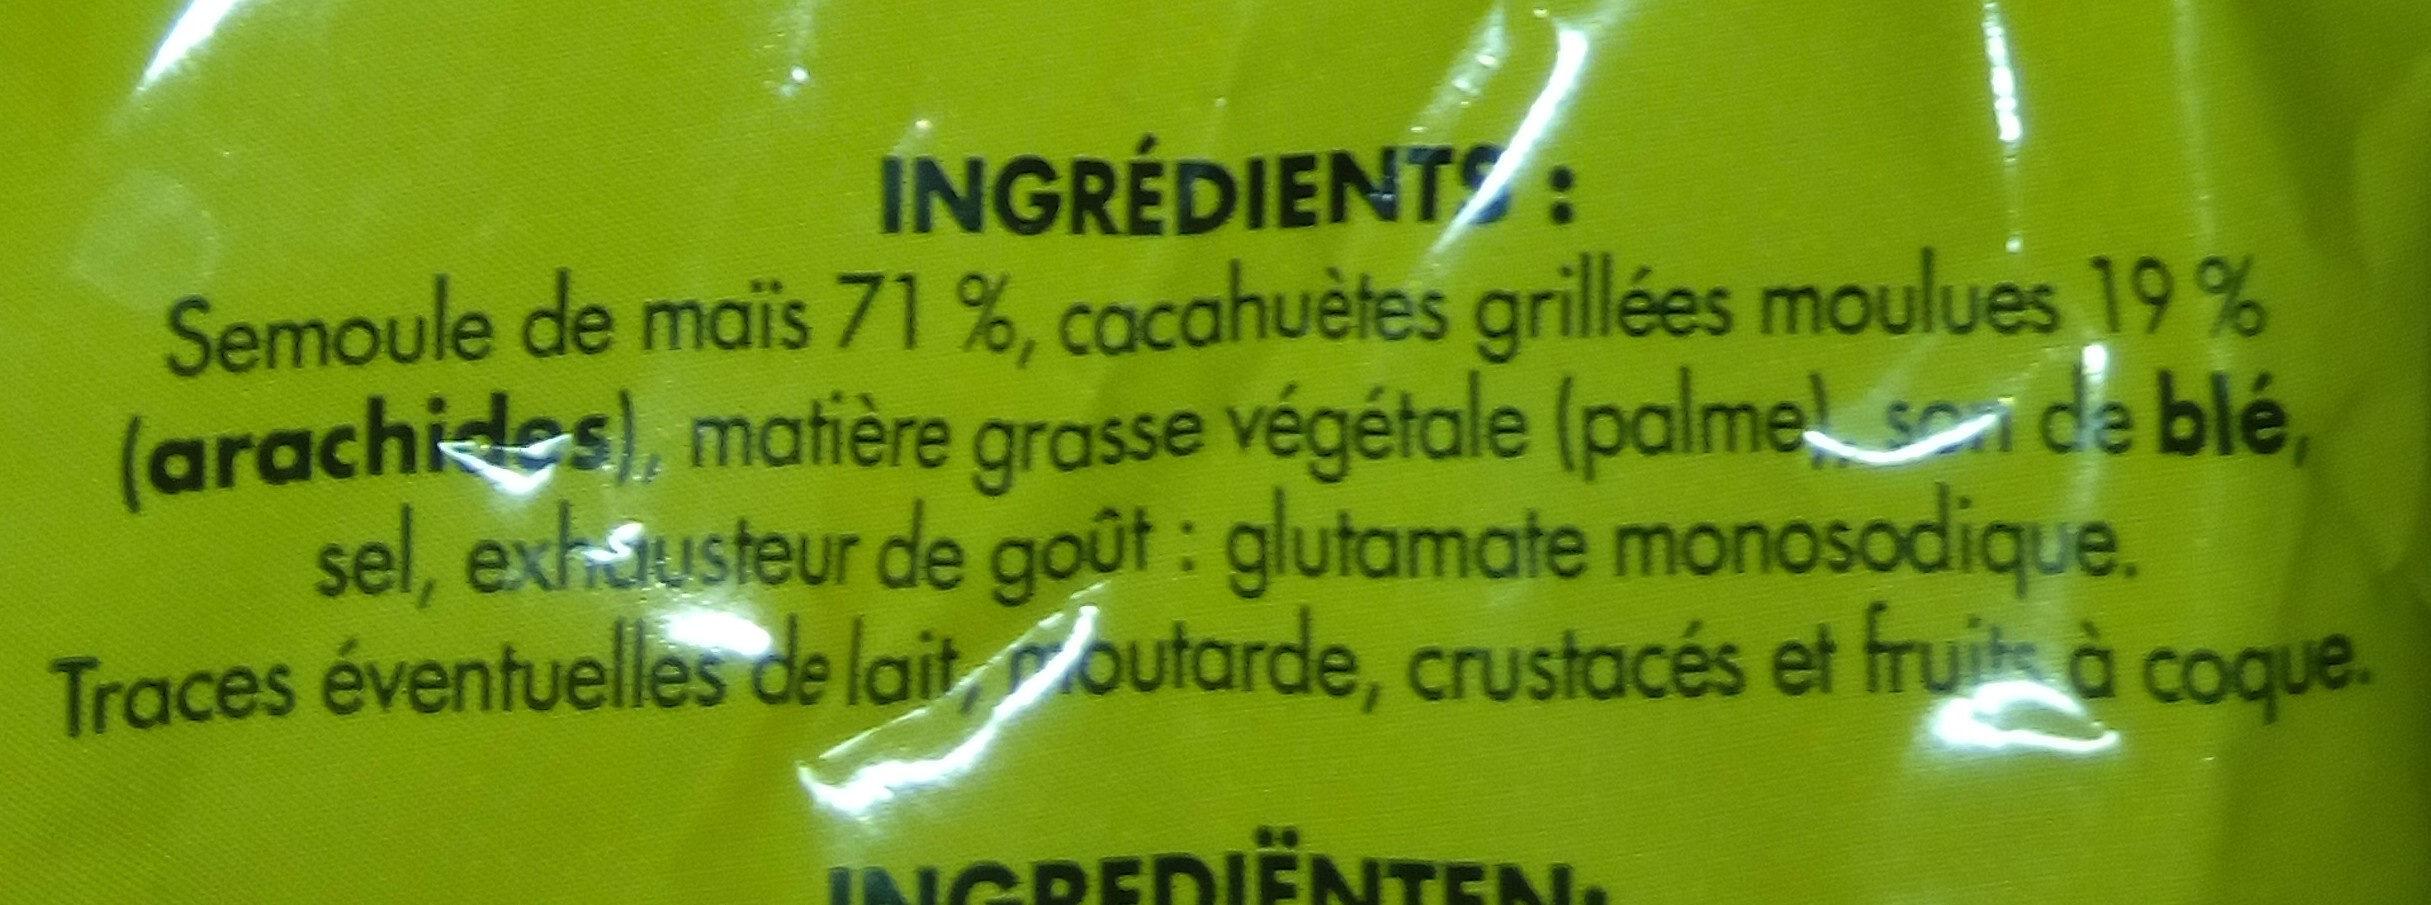 Soufflé à la cacahuète - Ingrediënten - fr